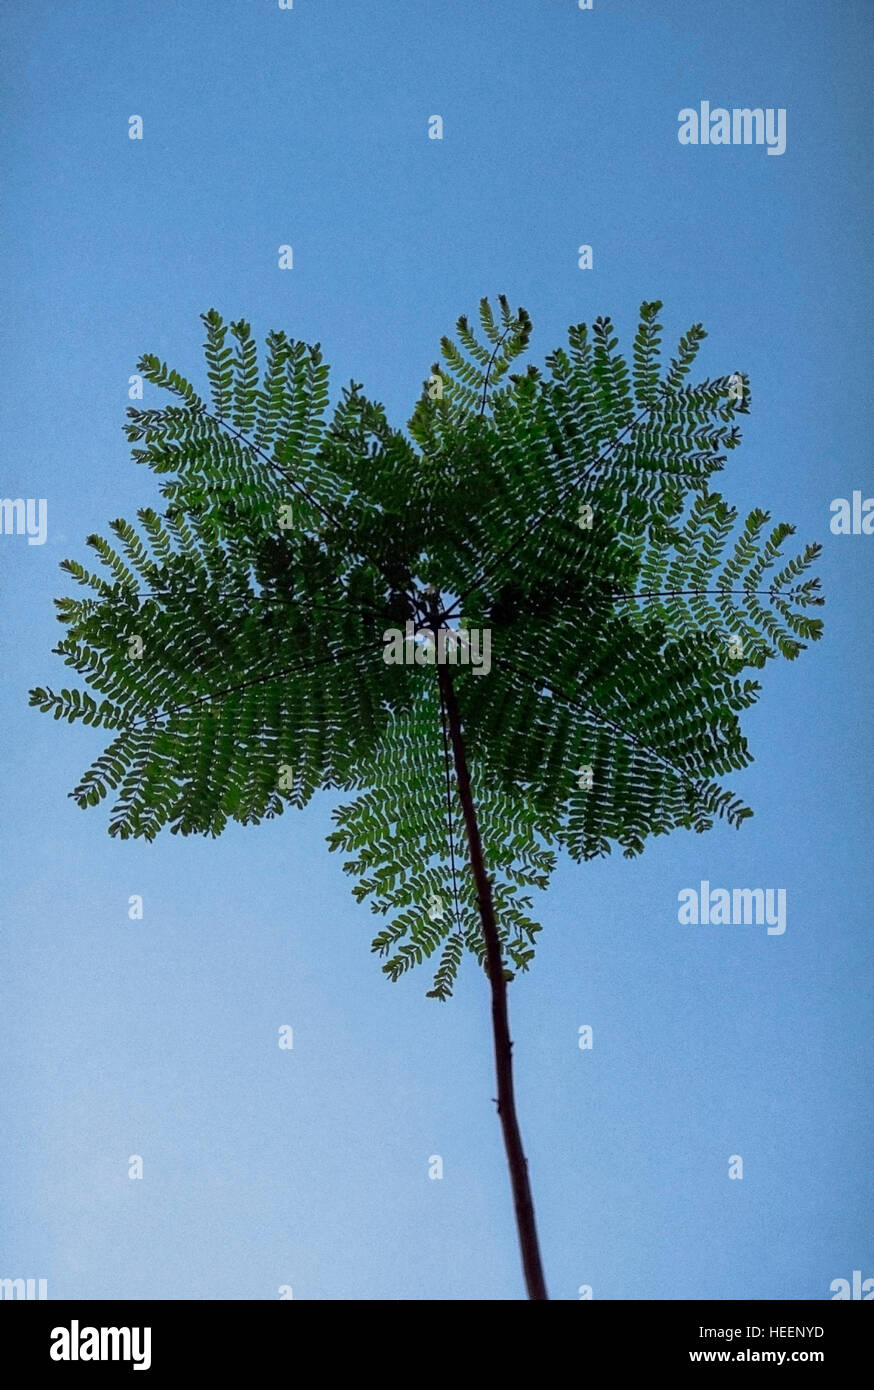 Branch of Gulmohar tree (Royal poinciana/Peacock) - Delonix regia Rafin - Stock Image